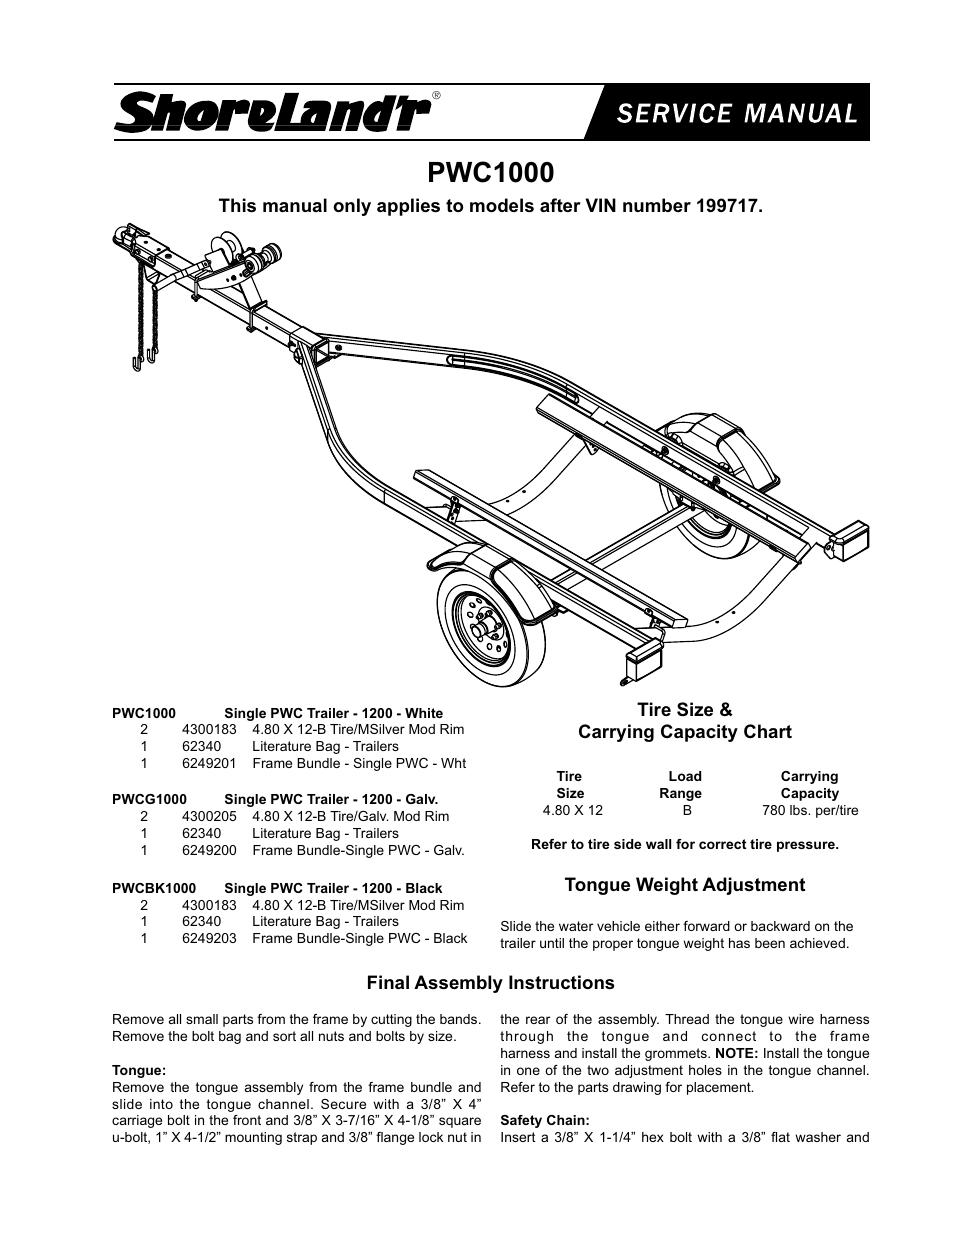 Shorelandr Pwc1000 V2 User Manual 4 Pages Also For Ss1023 Shorelander Trailer Wiring Harness Ss1024 Slr20w Slr20bw Slr20blw Slb20blw Slb20bw Slb20w Slb20lw Slf20lw 2x4 2x4w